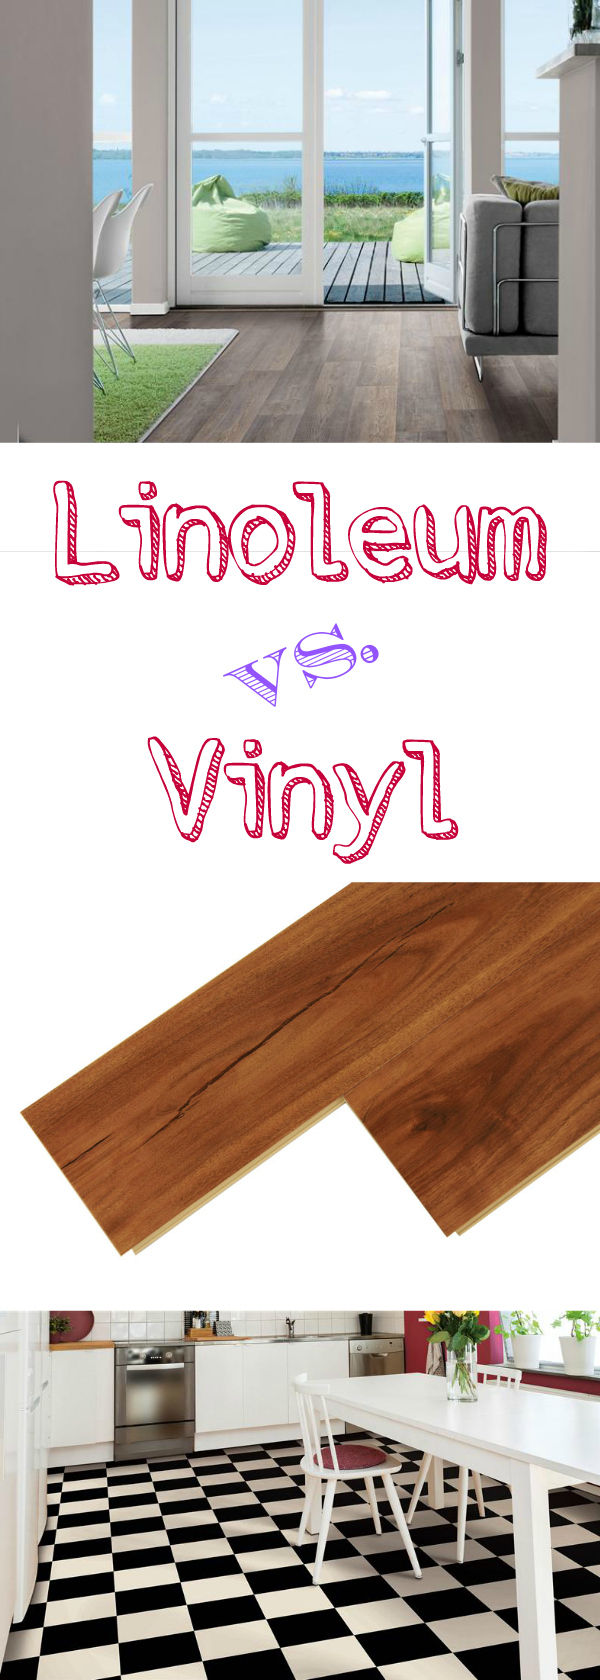 Fullsize Of Linoleum Vs Vinyl